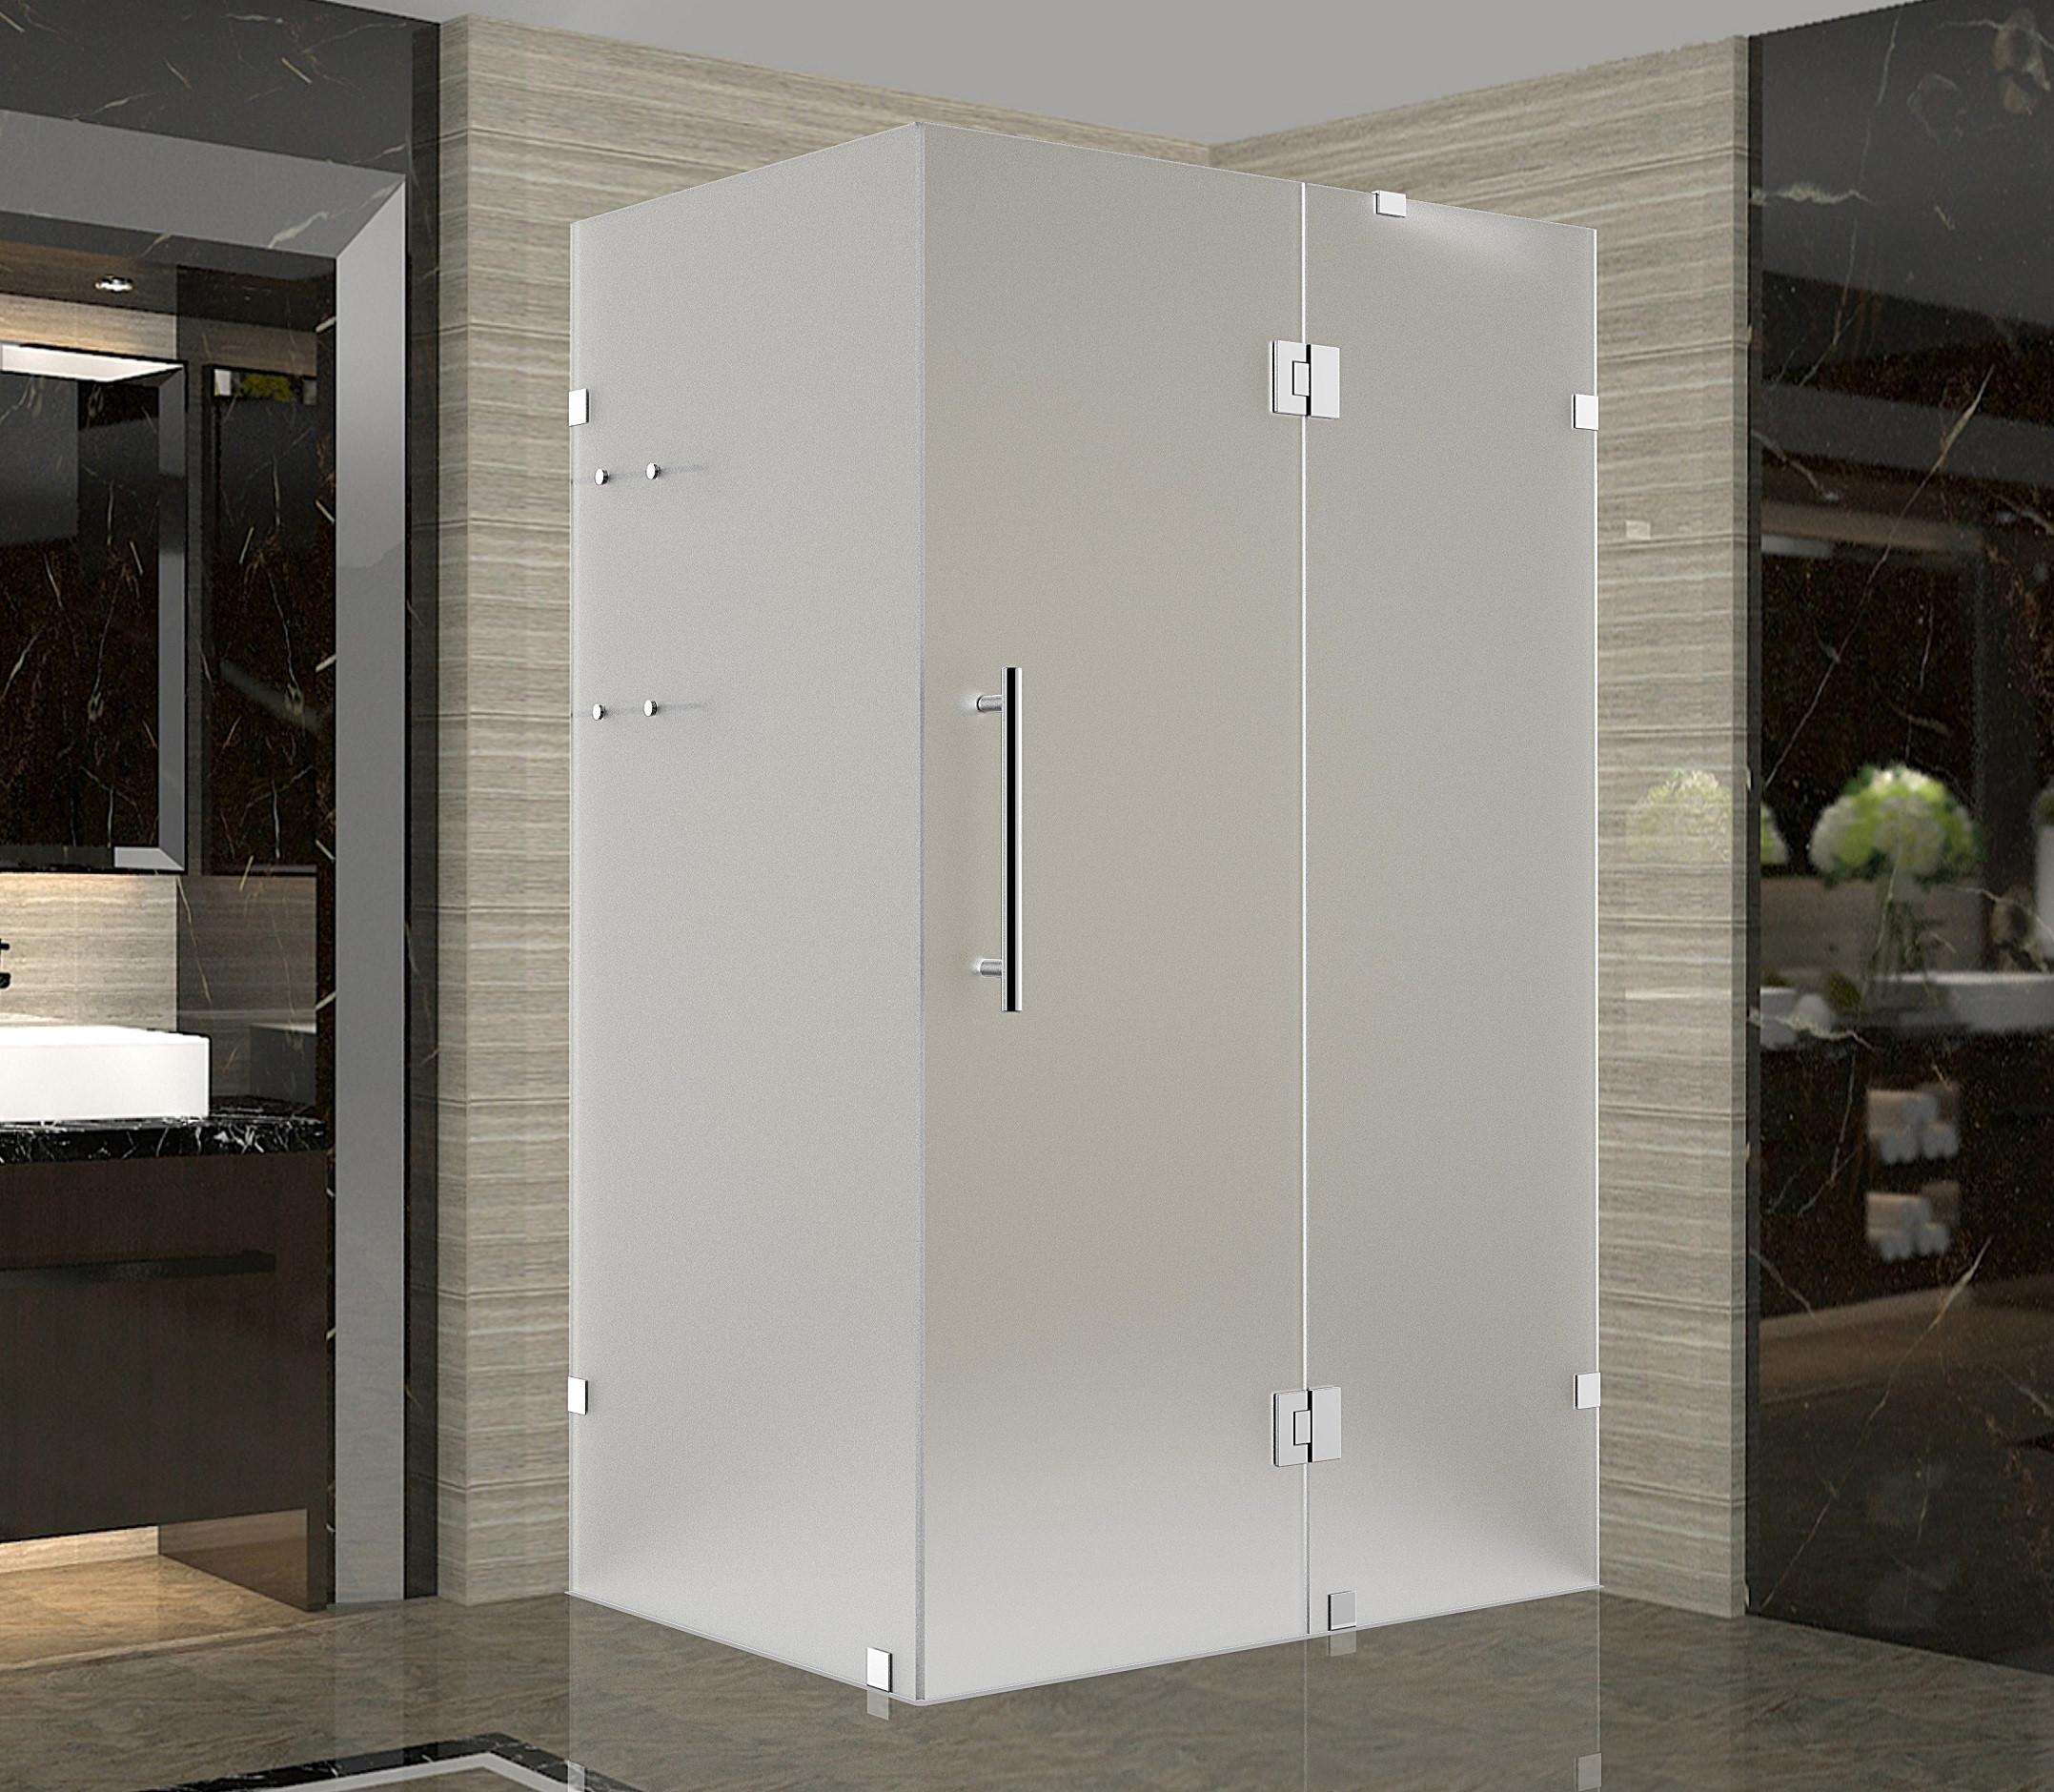 Aston Global SEN992F-SS-3532-10 Stainless Steel Completely Frameless Frosted Glass Shower Enclosure